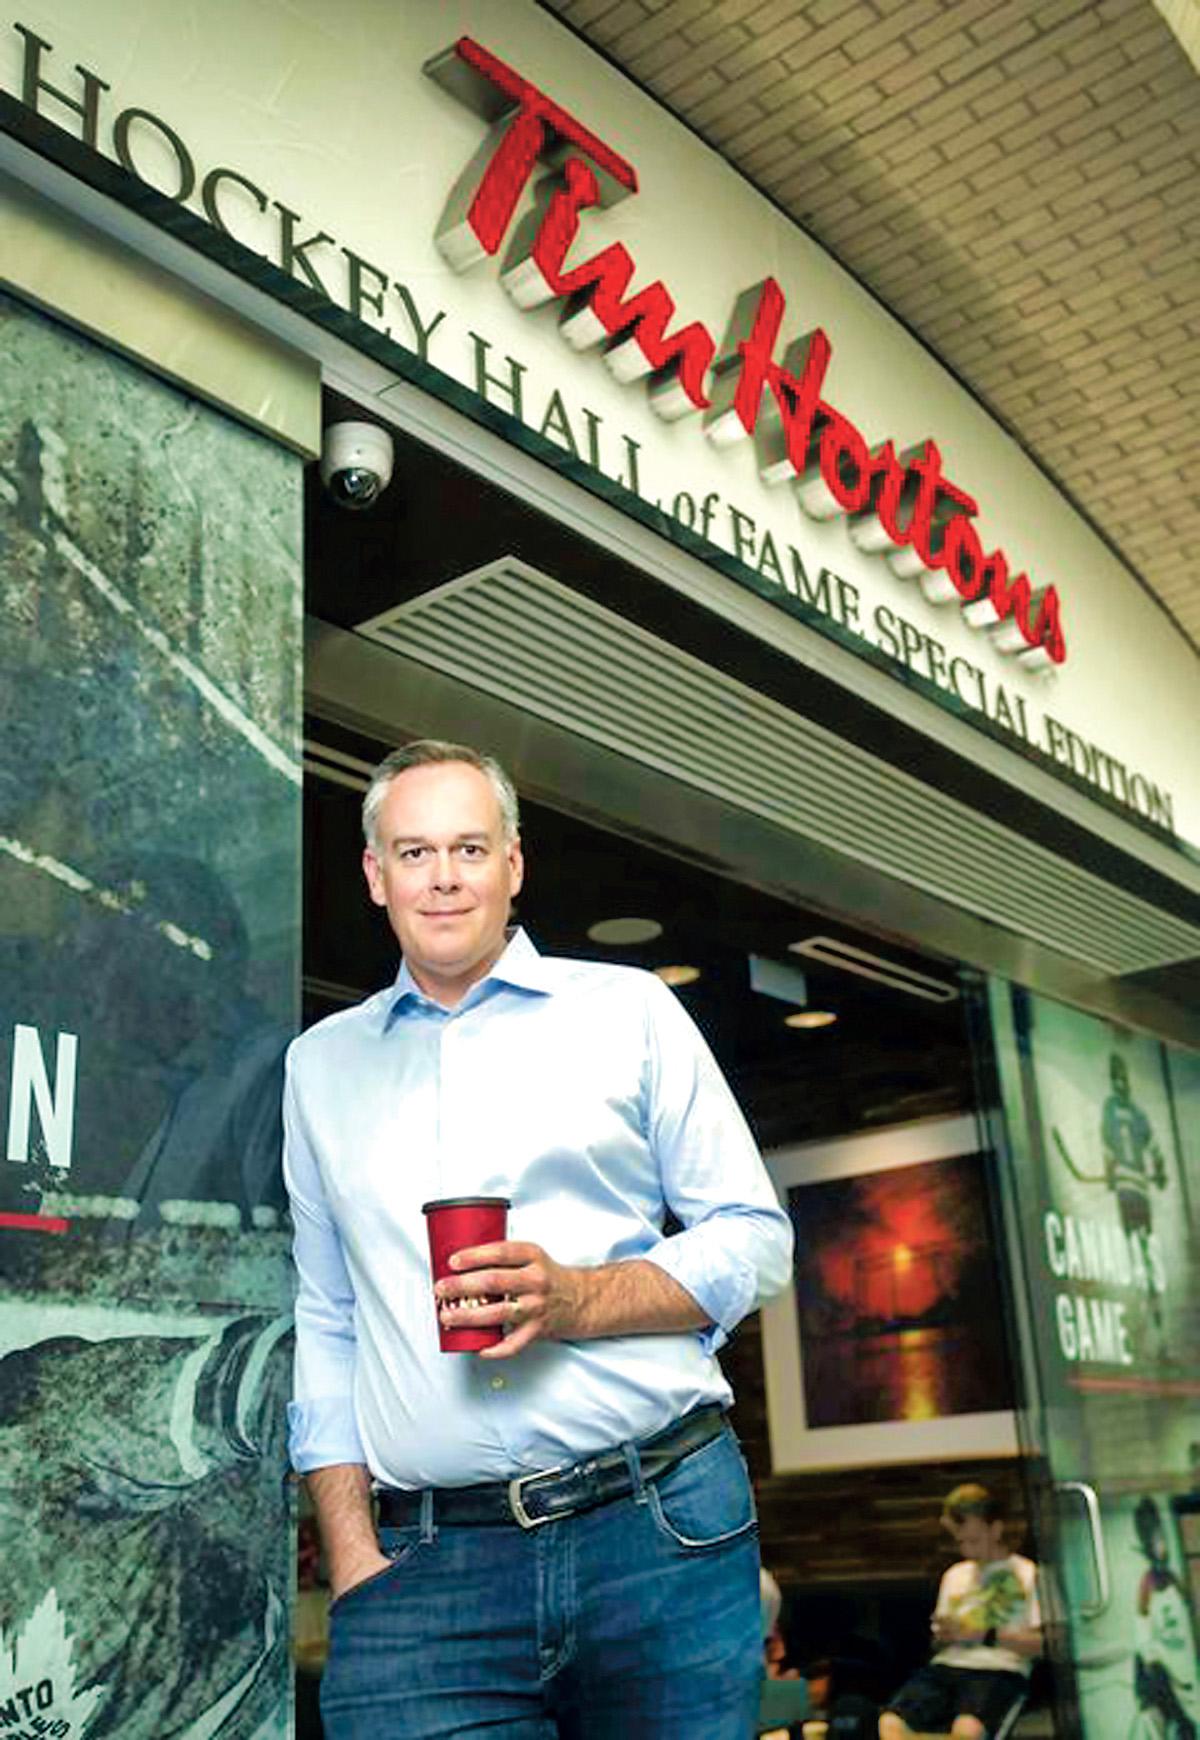 ■RBI企業總監富爾頓表示,集團旗下的Burger King、Tim Horton's及Popeyes,均擁有其獨特的市場身份及公司文化。星報